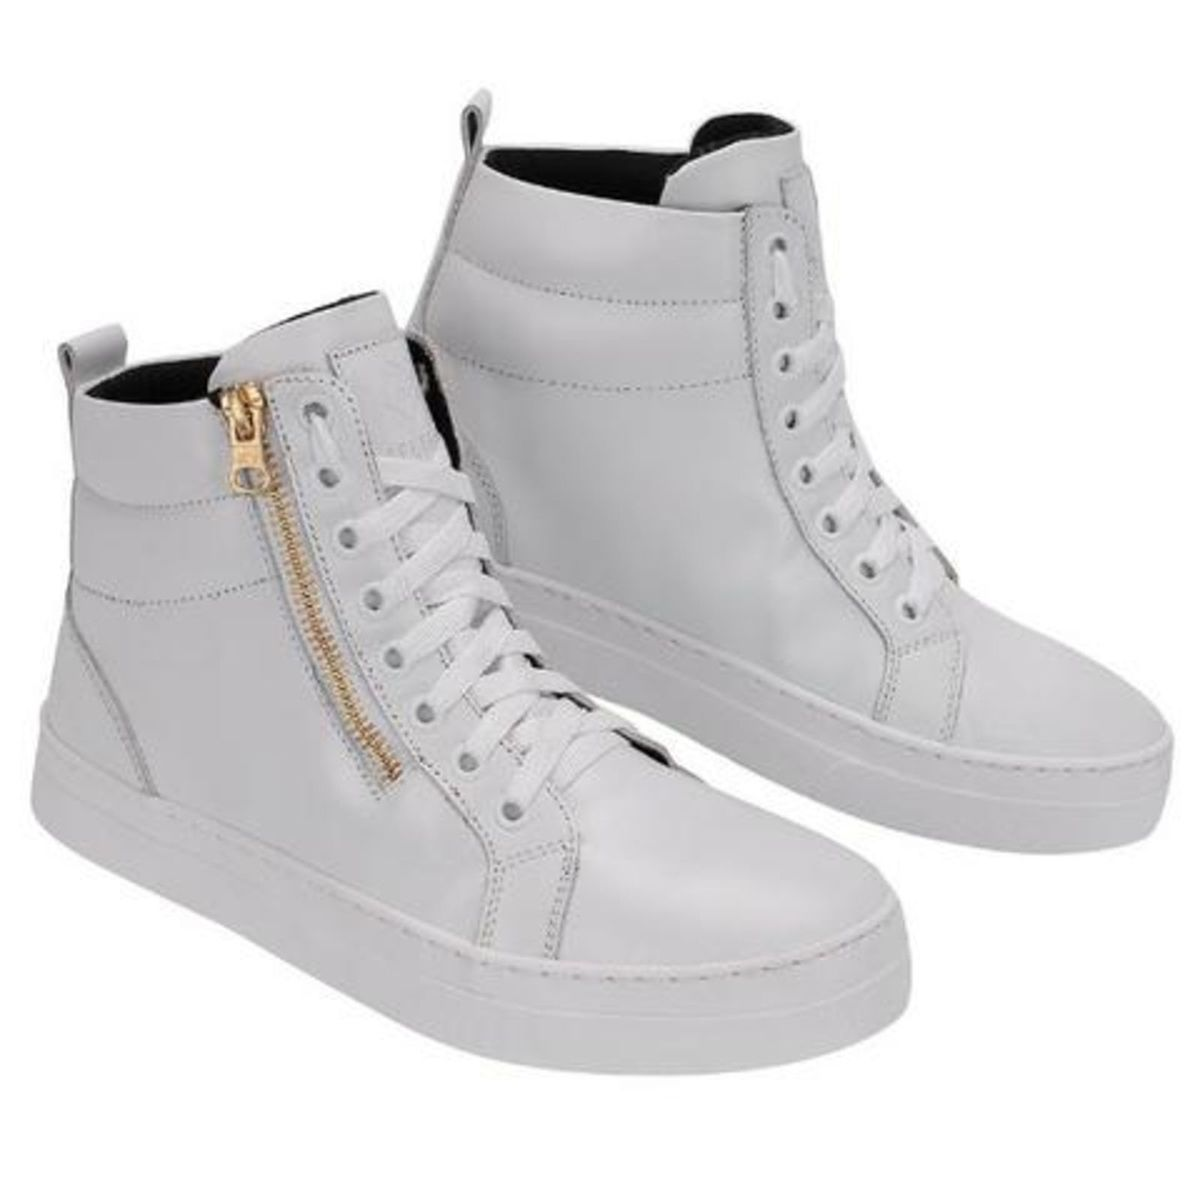 de9346236 Bota Sneaker Feminino de Zíper